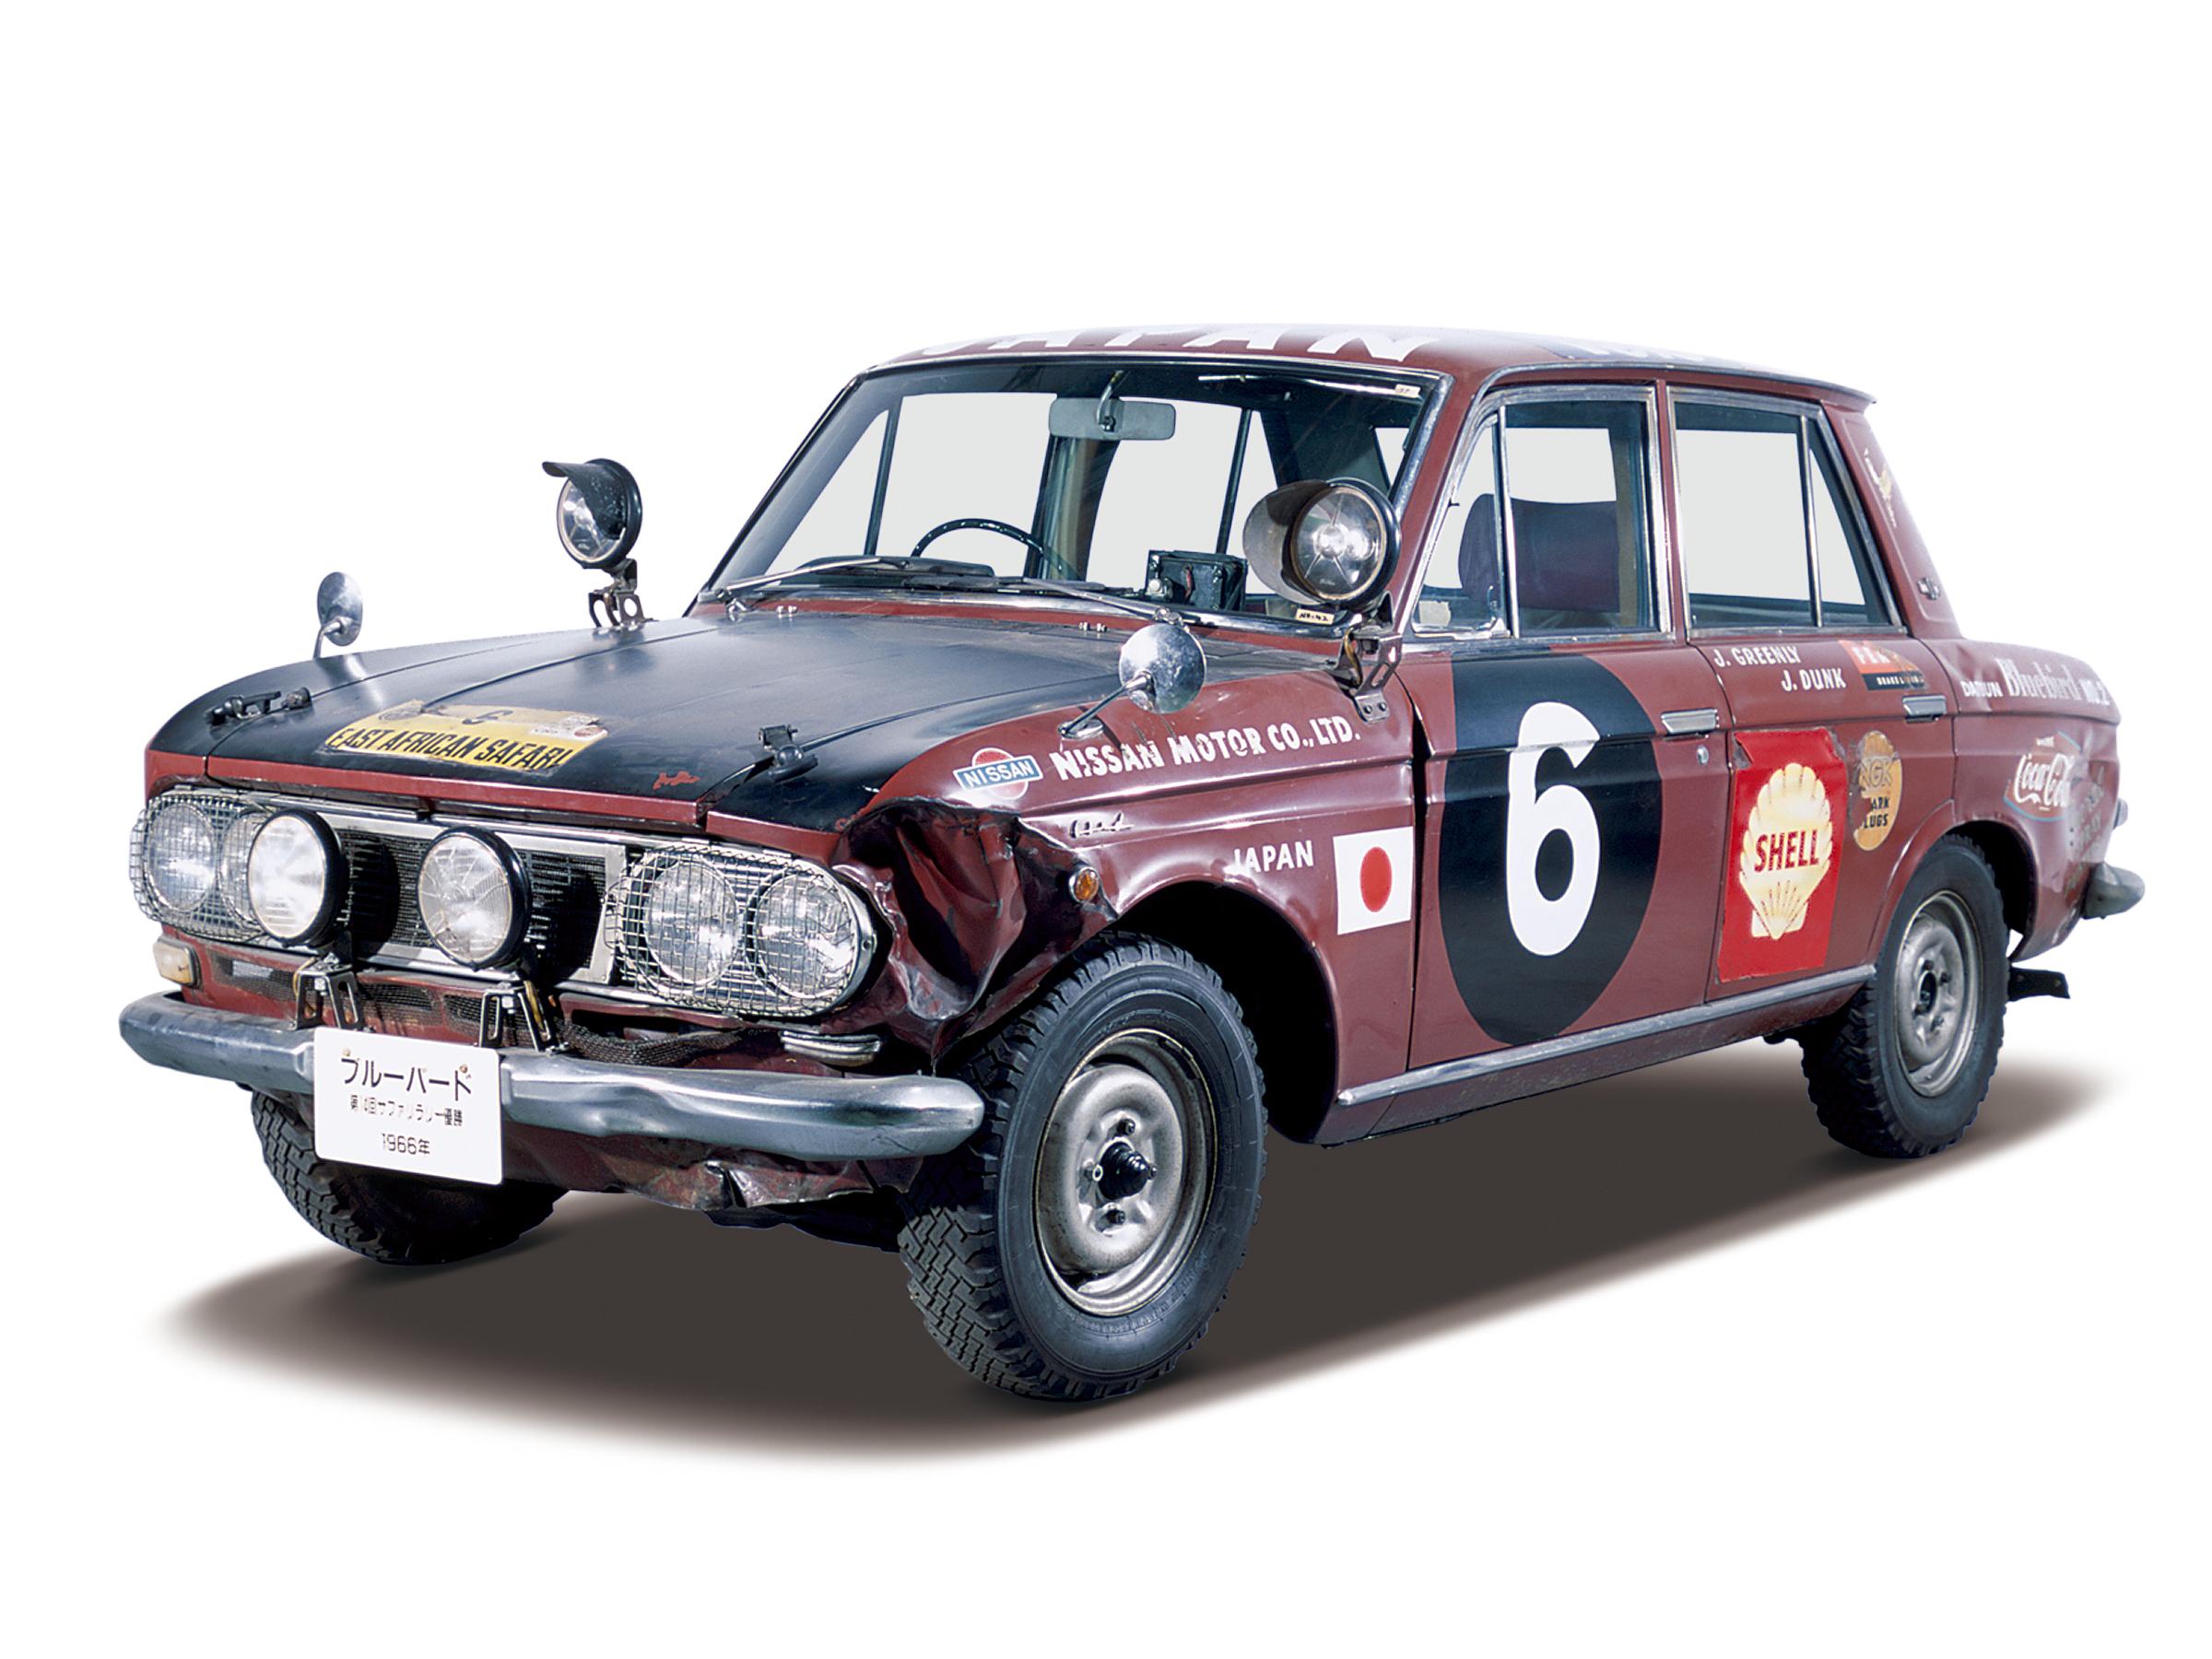 Nissan Heritage Collection Datsun Bluebird 1300ss